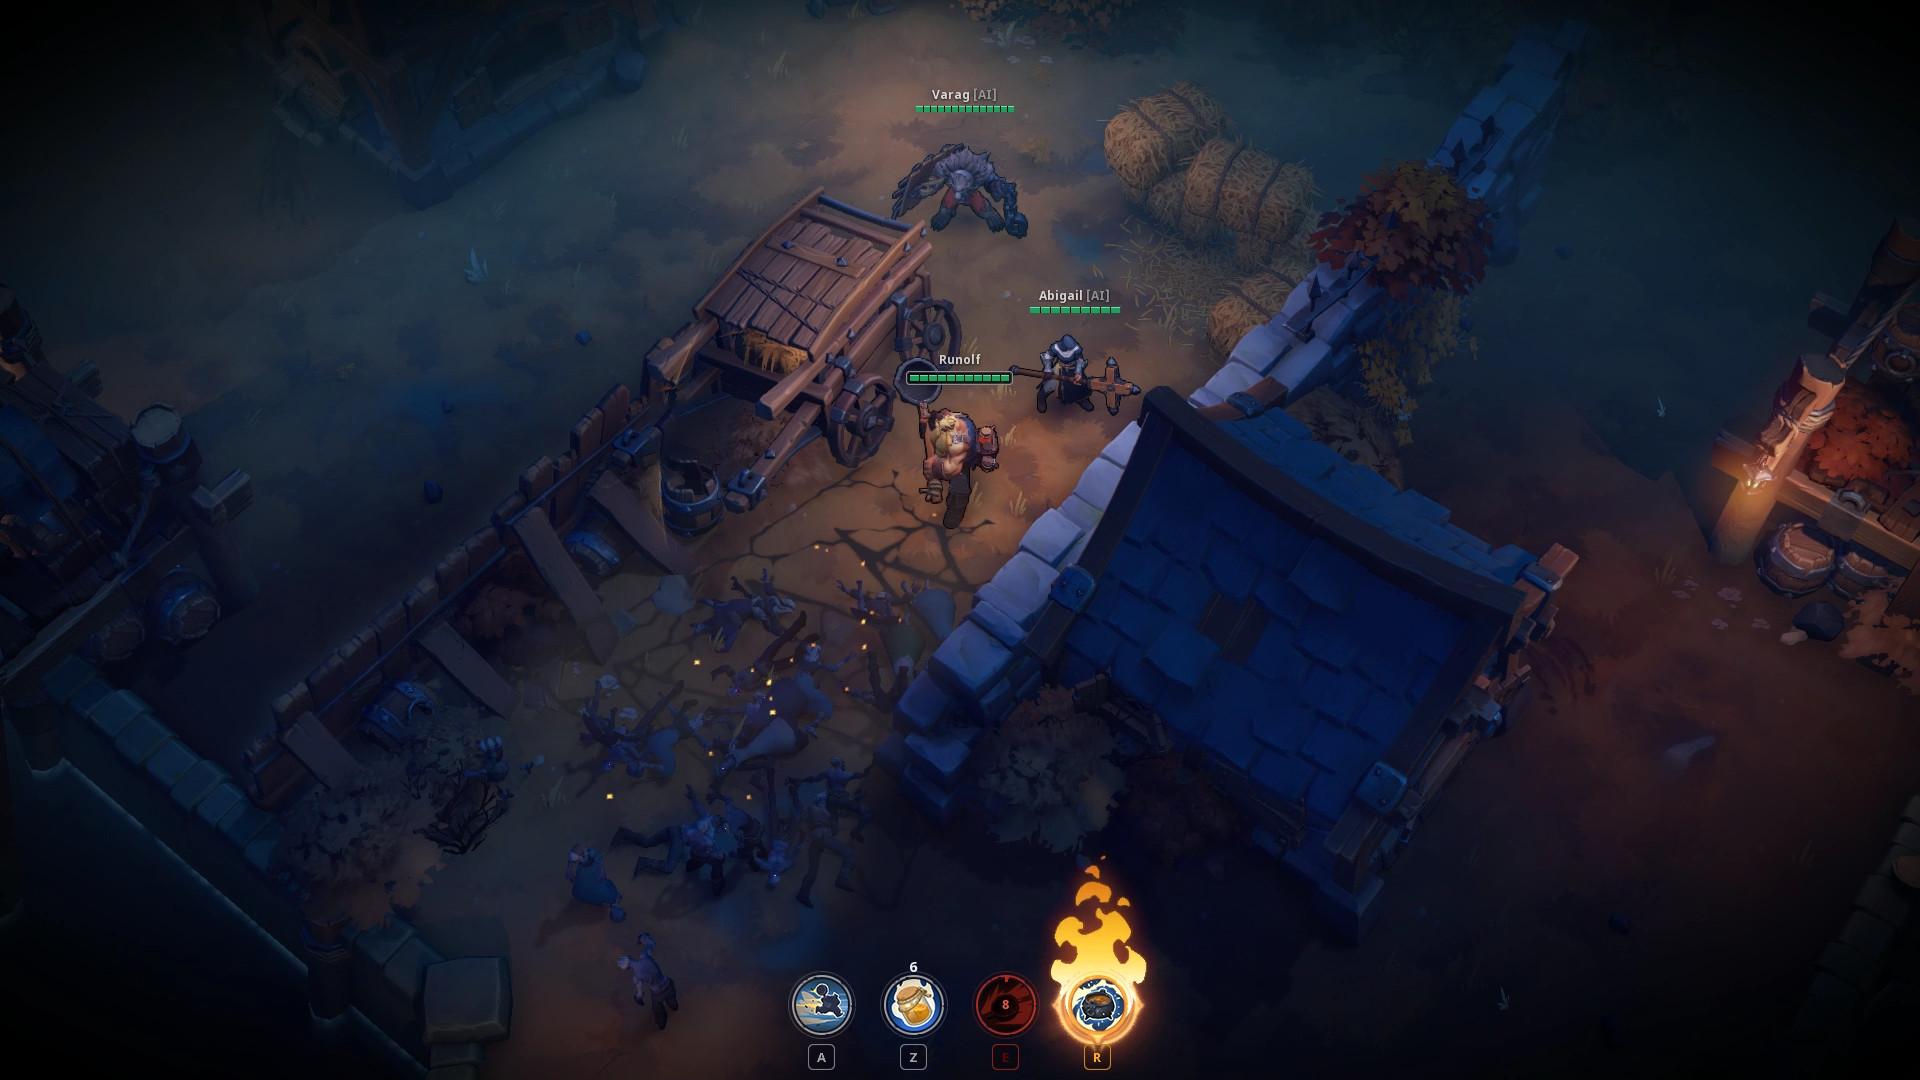 Darksburg screenshot